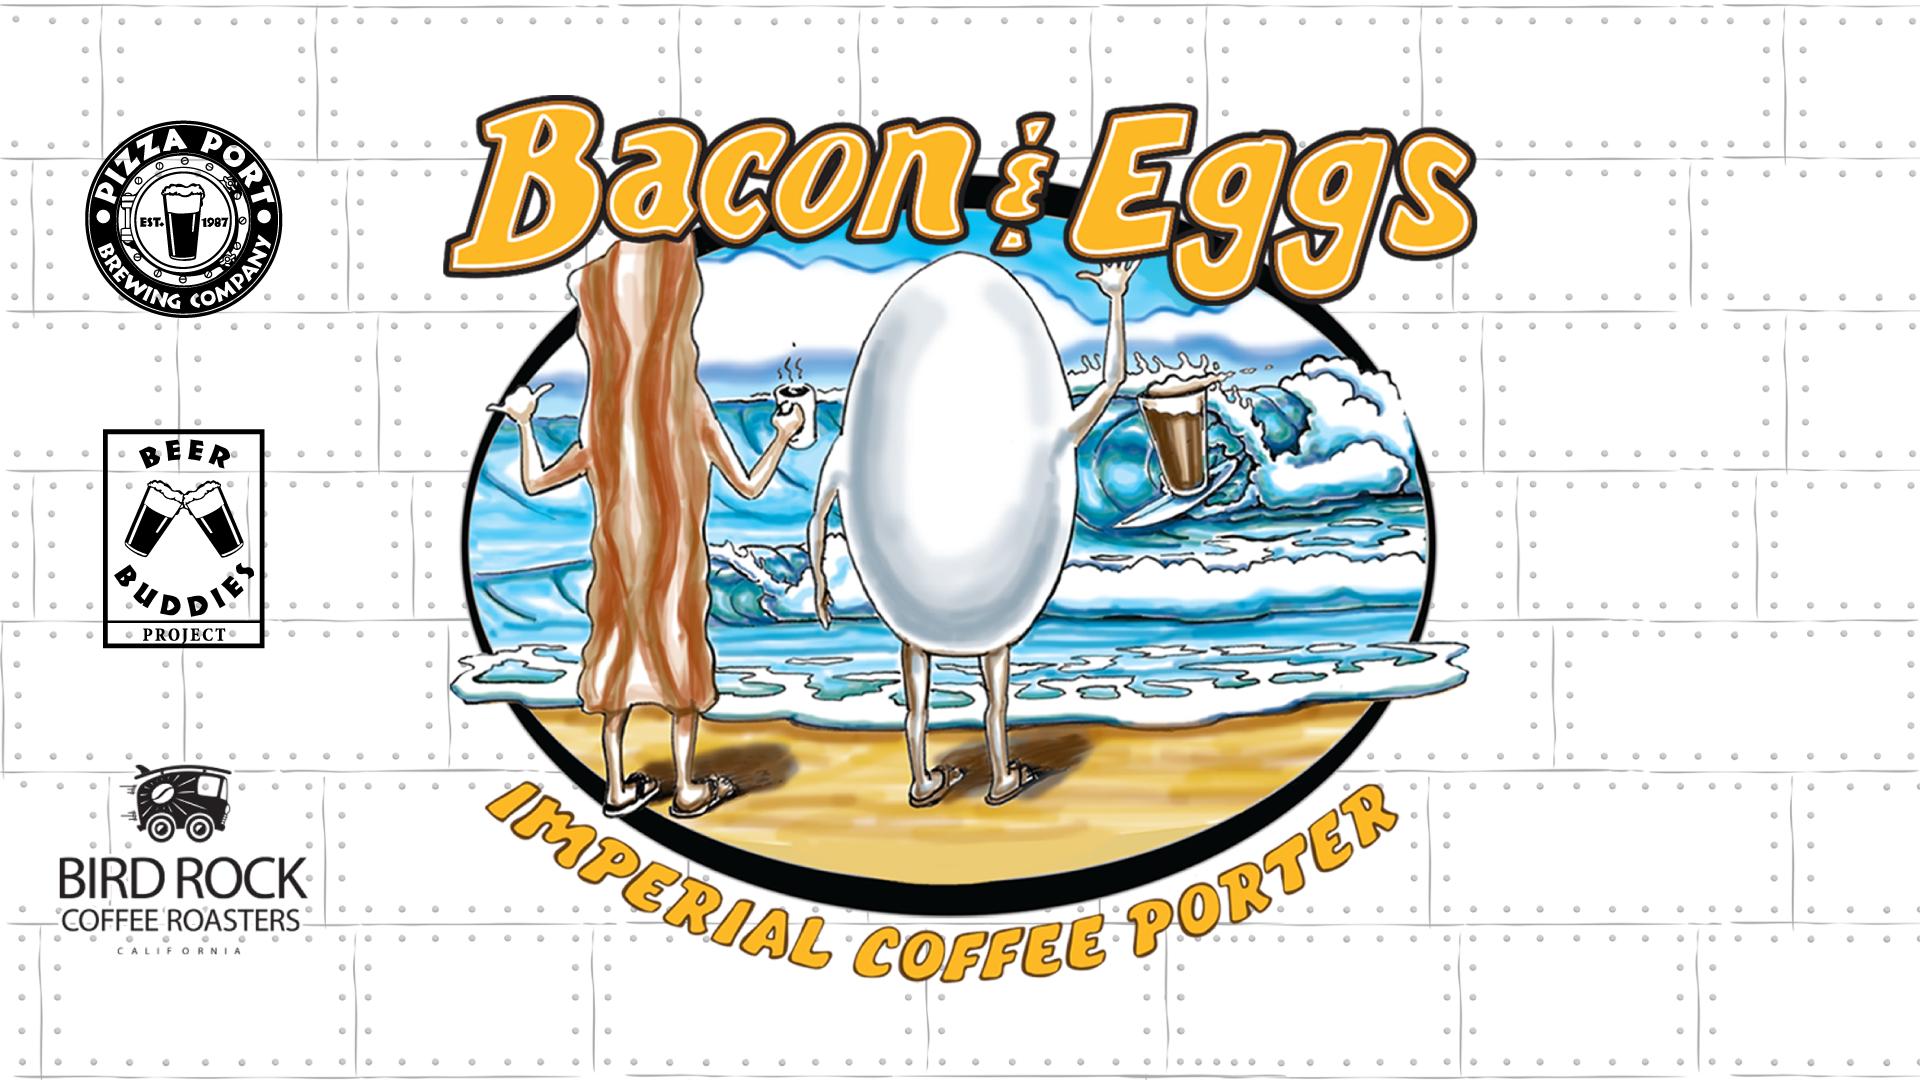 Bacon & Eggs Can Release